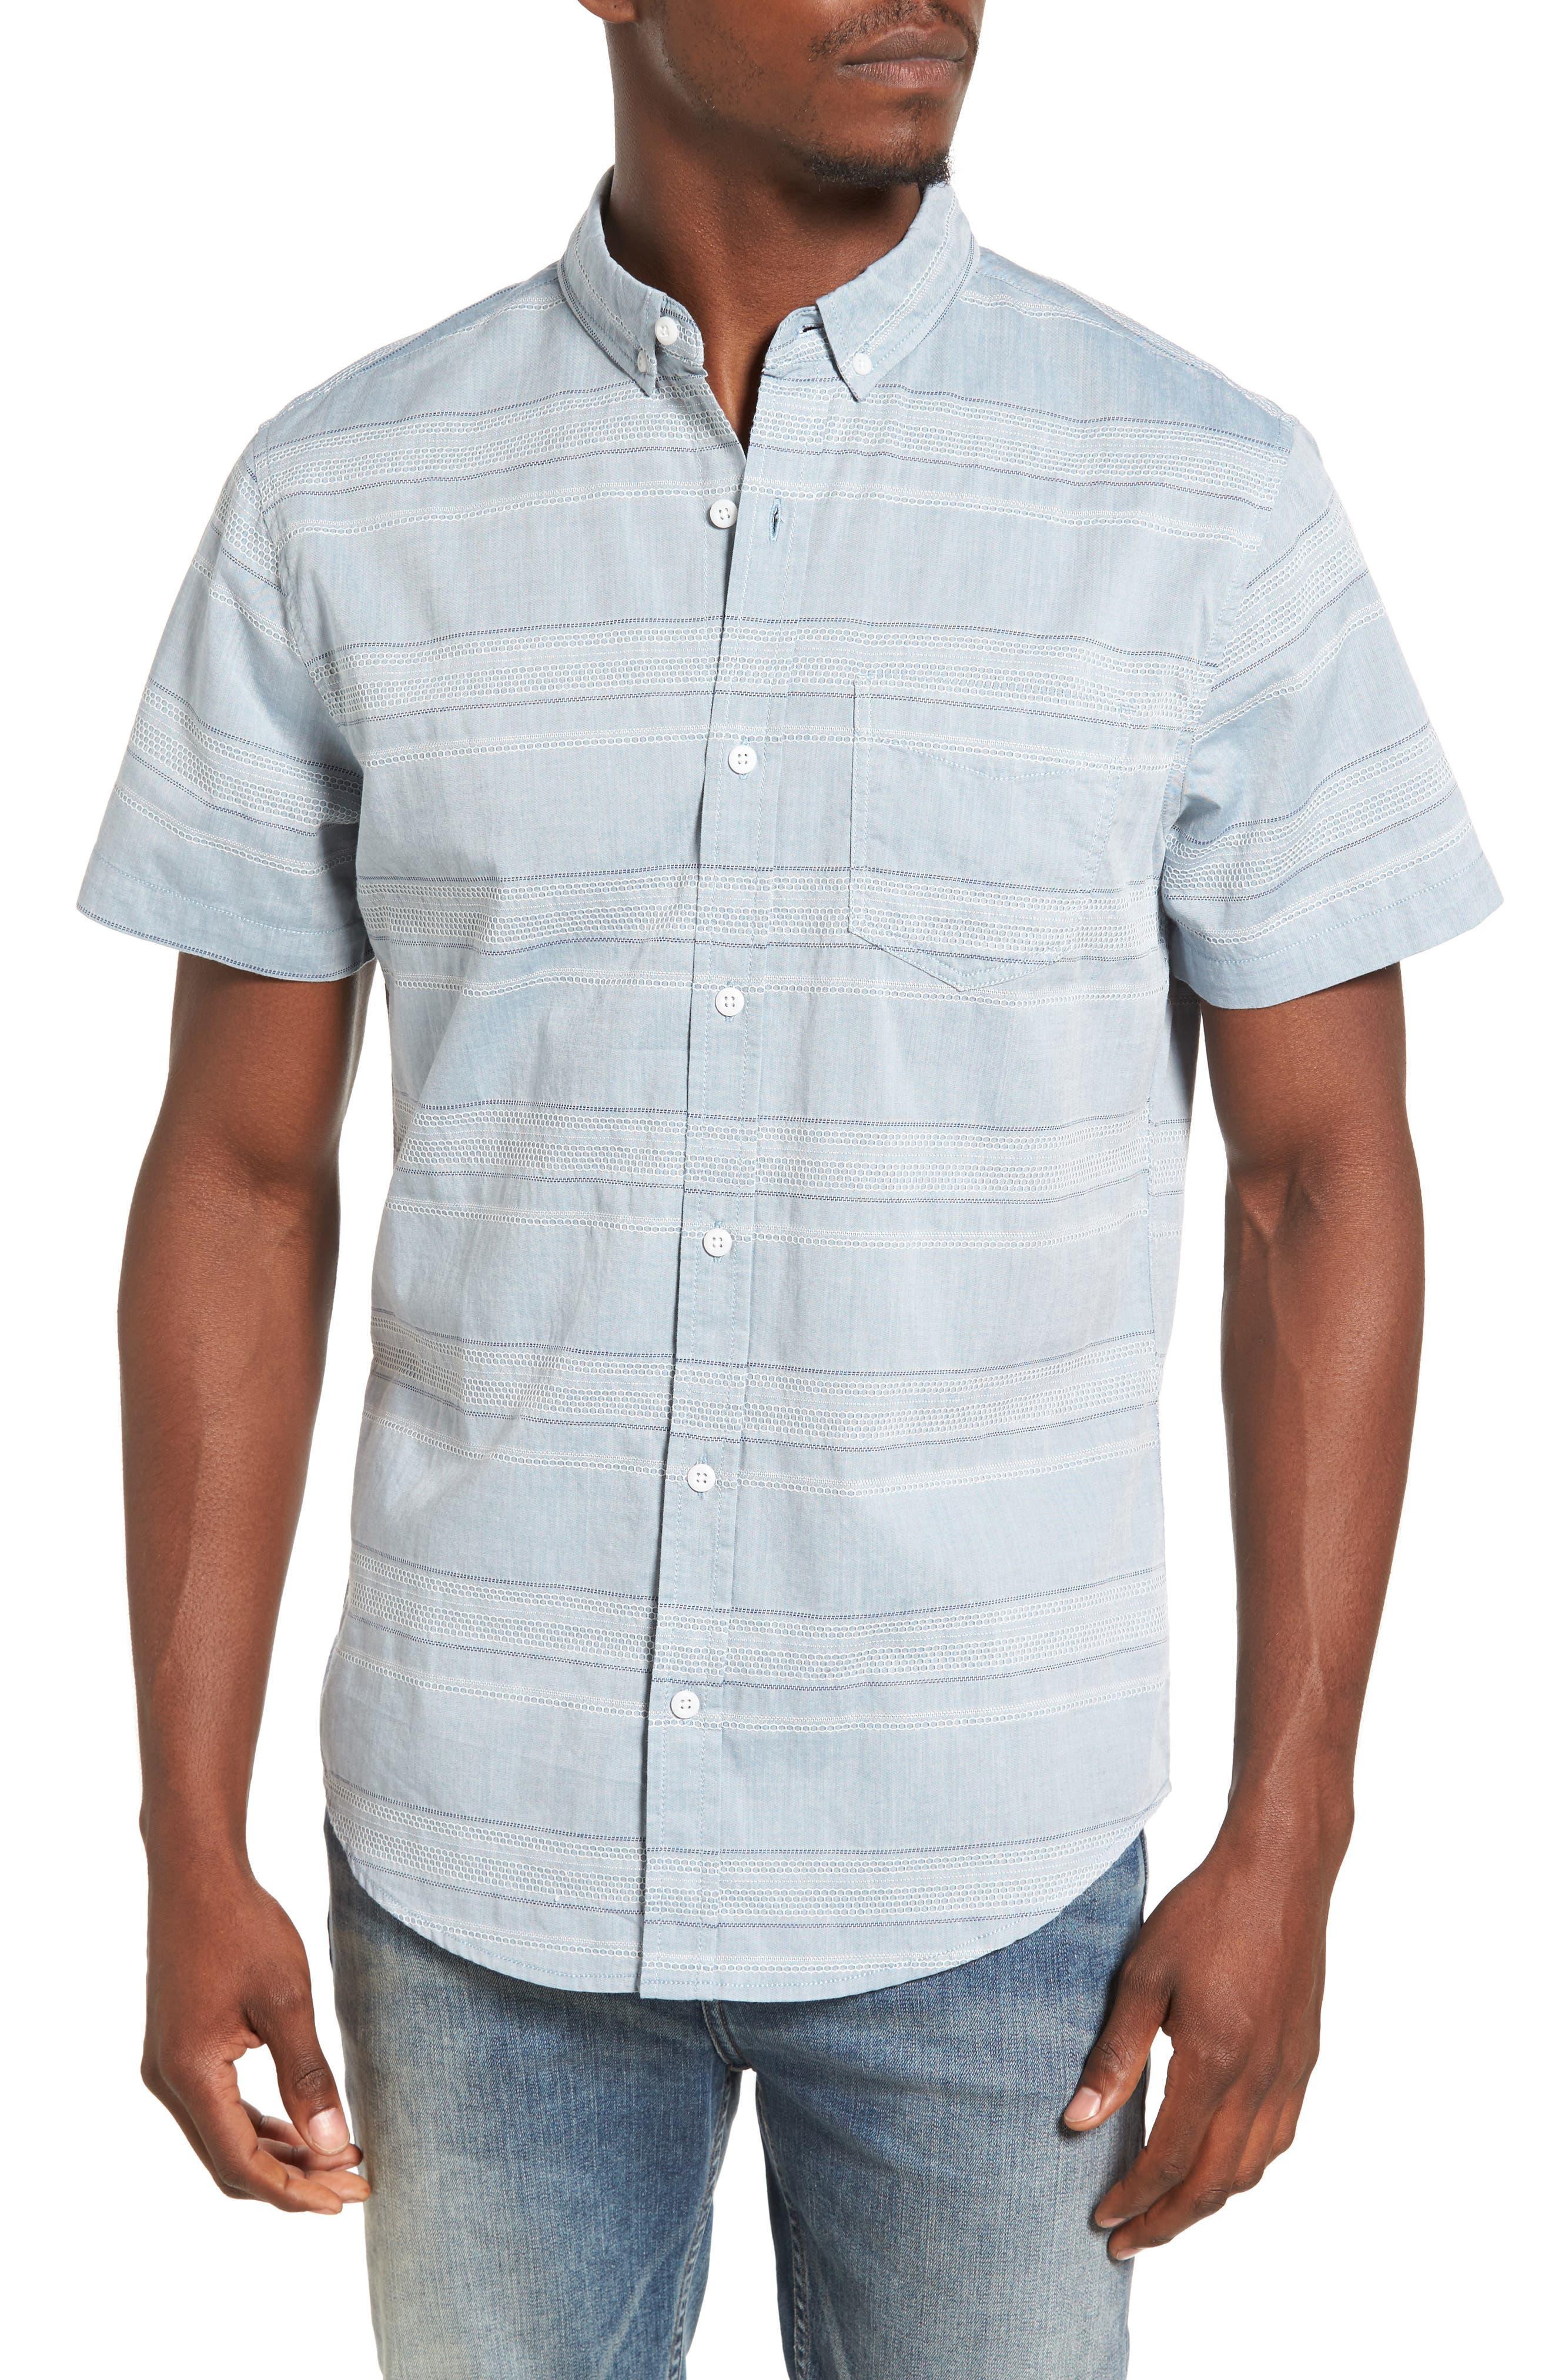 Main Image - 1901 Jacquard Trim Fit Sport Shirt